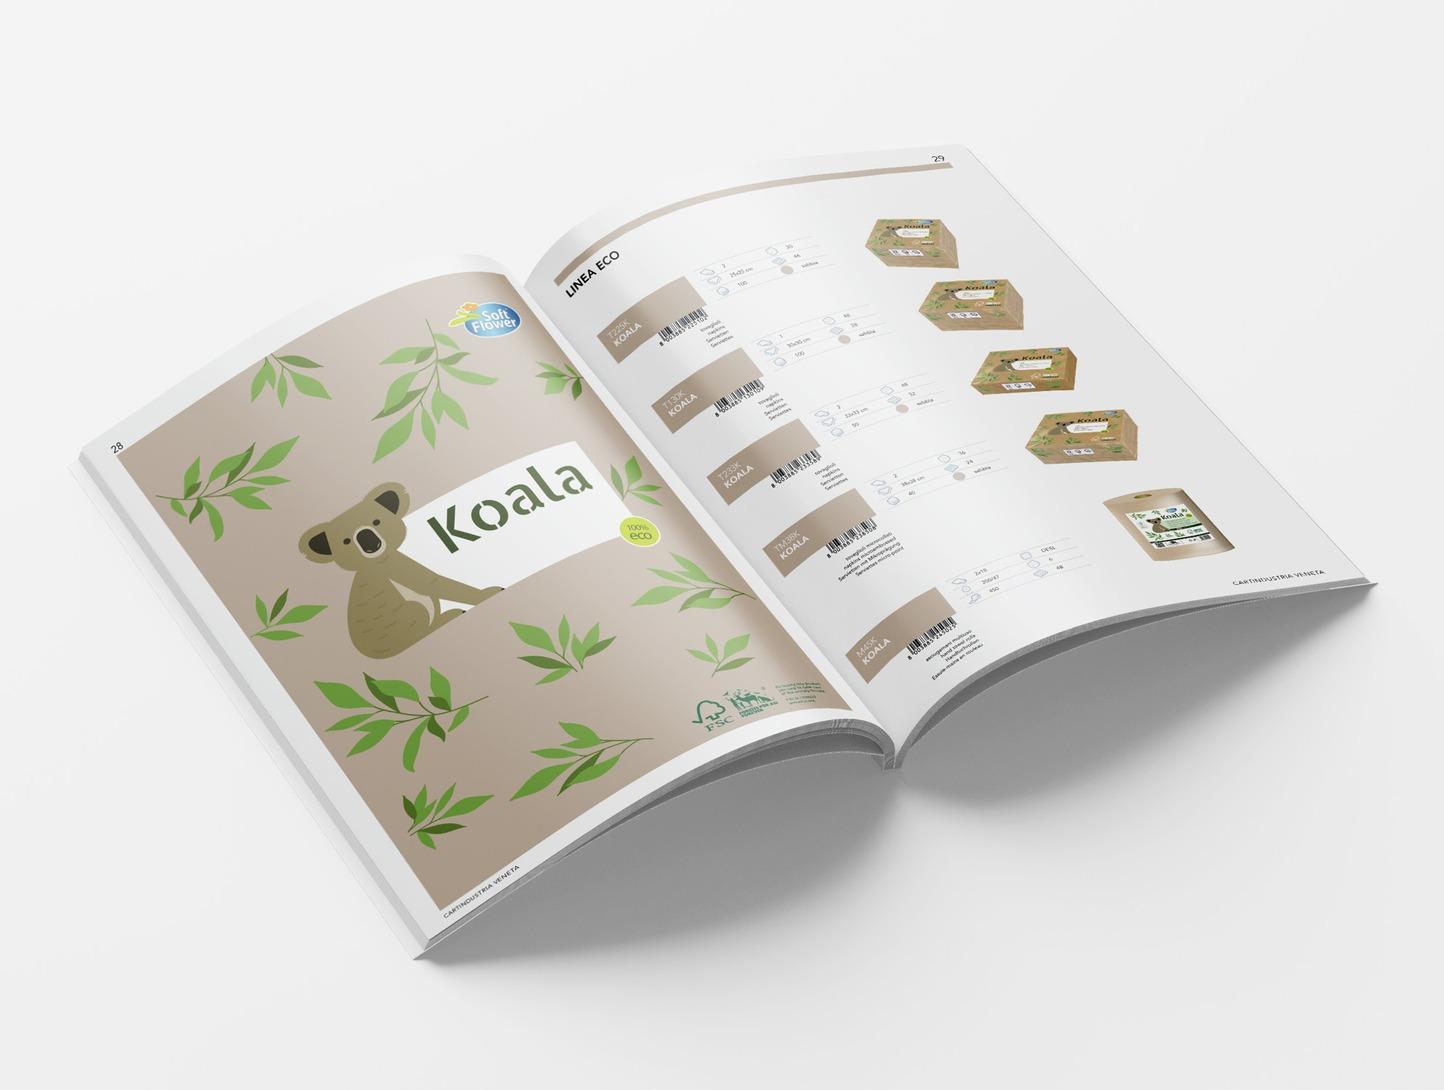 Linea Eco / Eco product